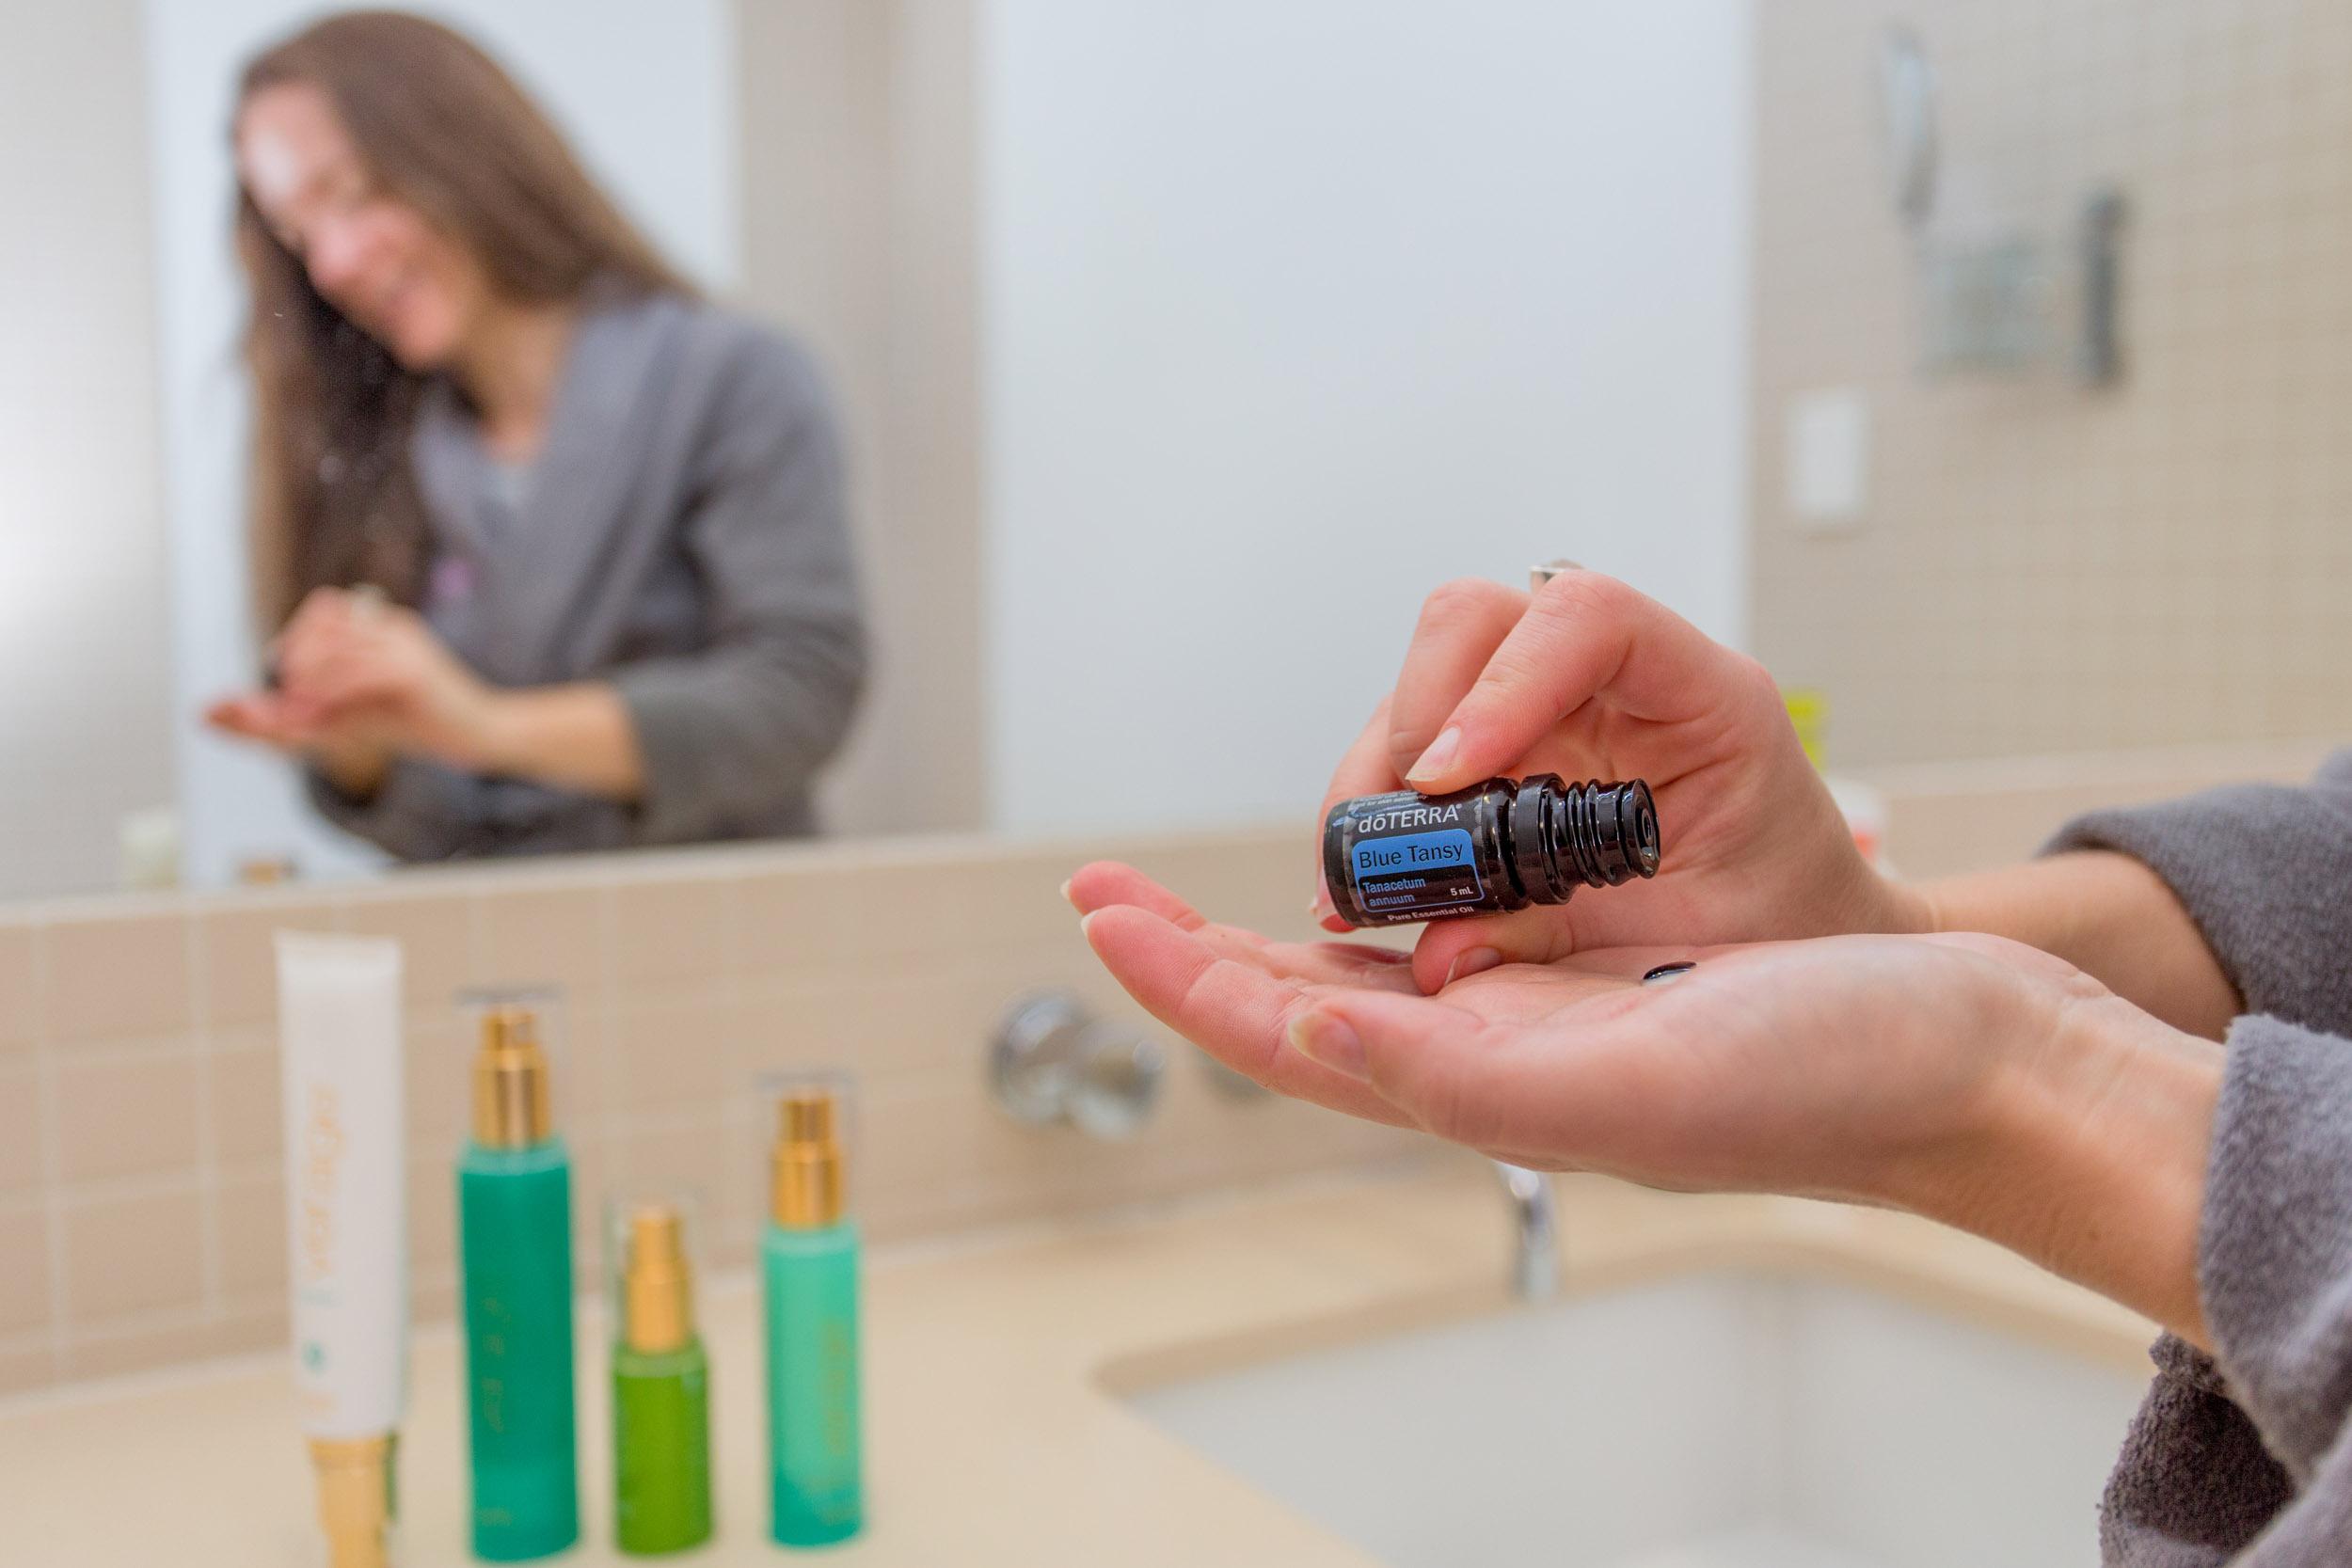 bathroom-personal-brand-photography-doterra-oils.jpg